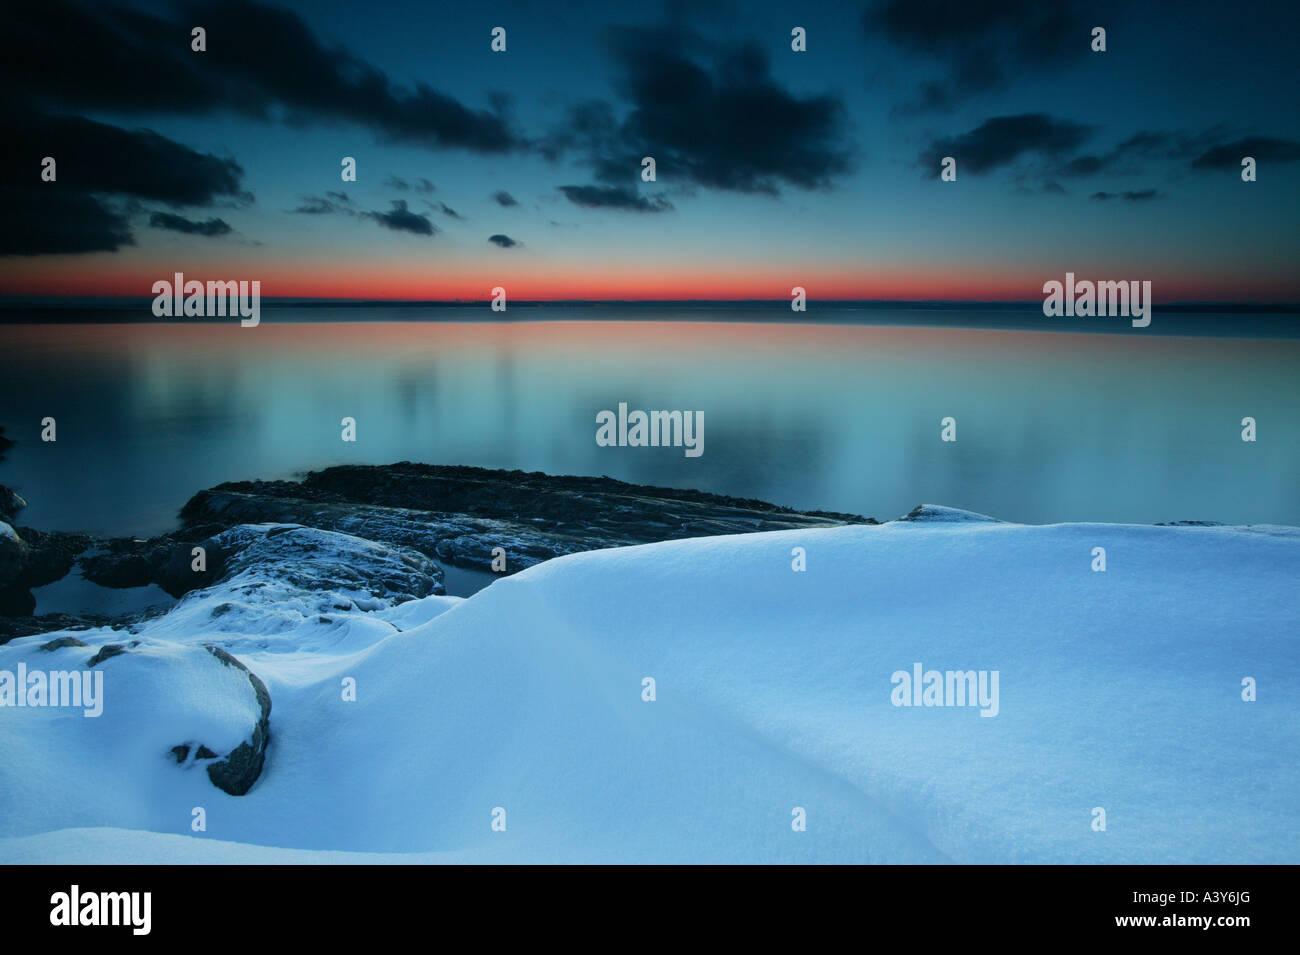 Coastal winter landscape after dark at Larkollen in Rygge kommune, Østfold fylke, Norway. Stock Photo